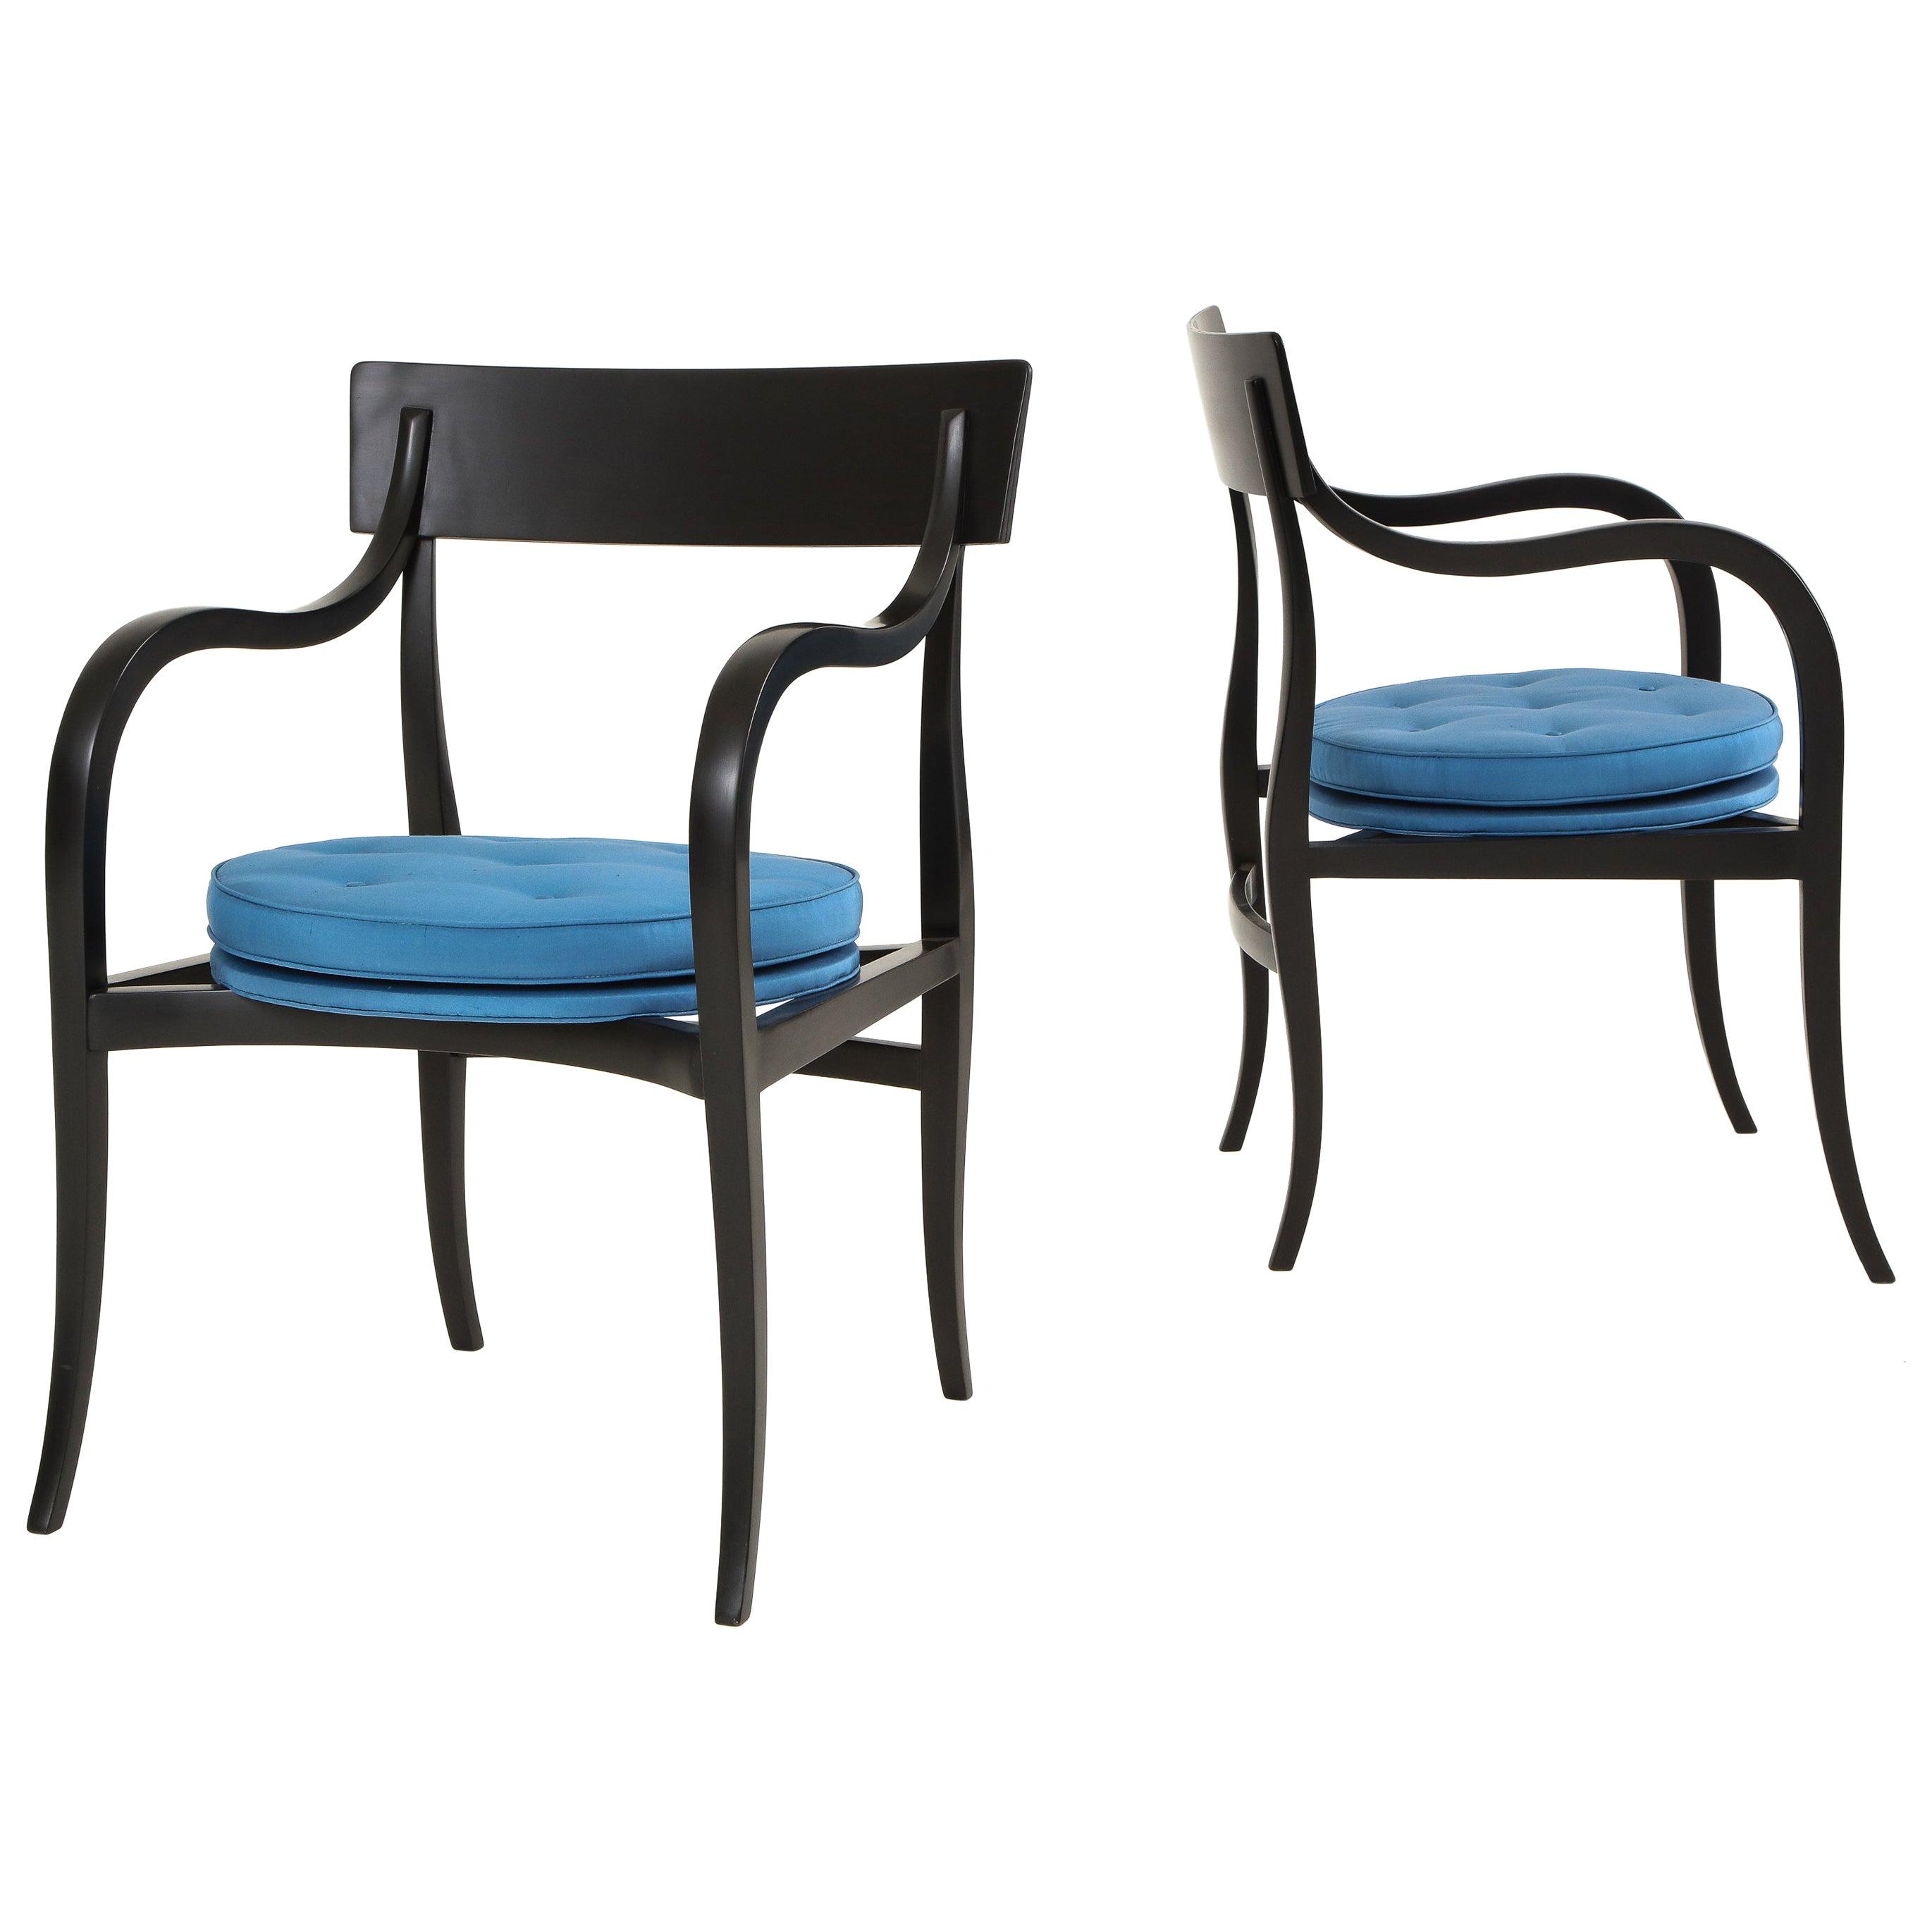 "Pair of Edward Wormley ""Alexandria"" Chairs for Dunbar"